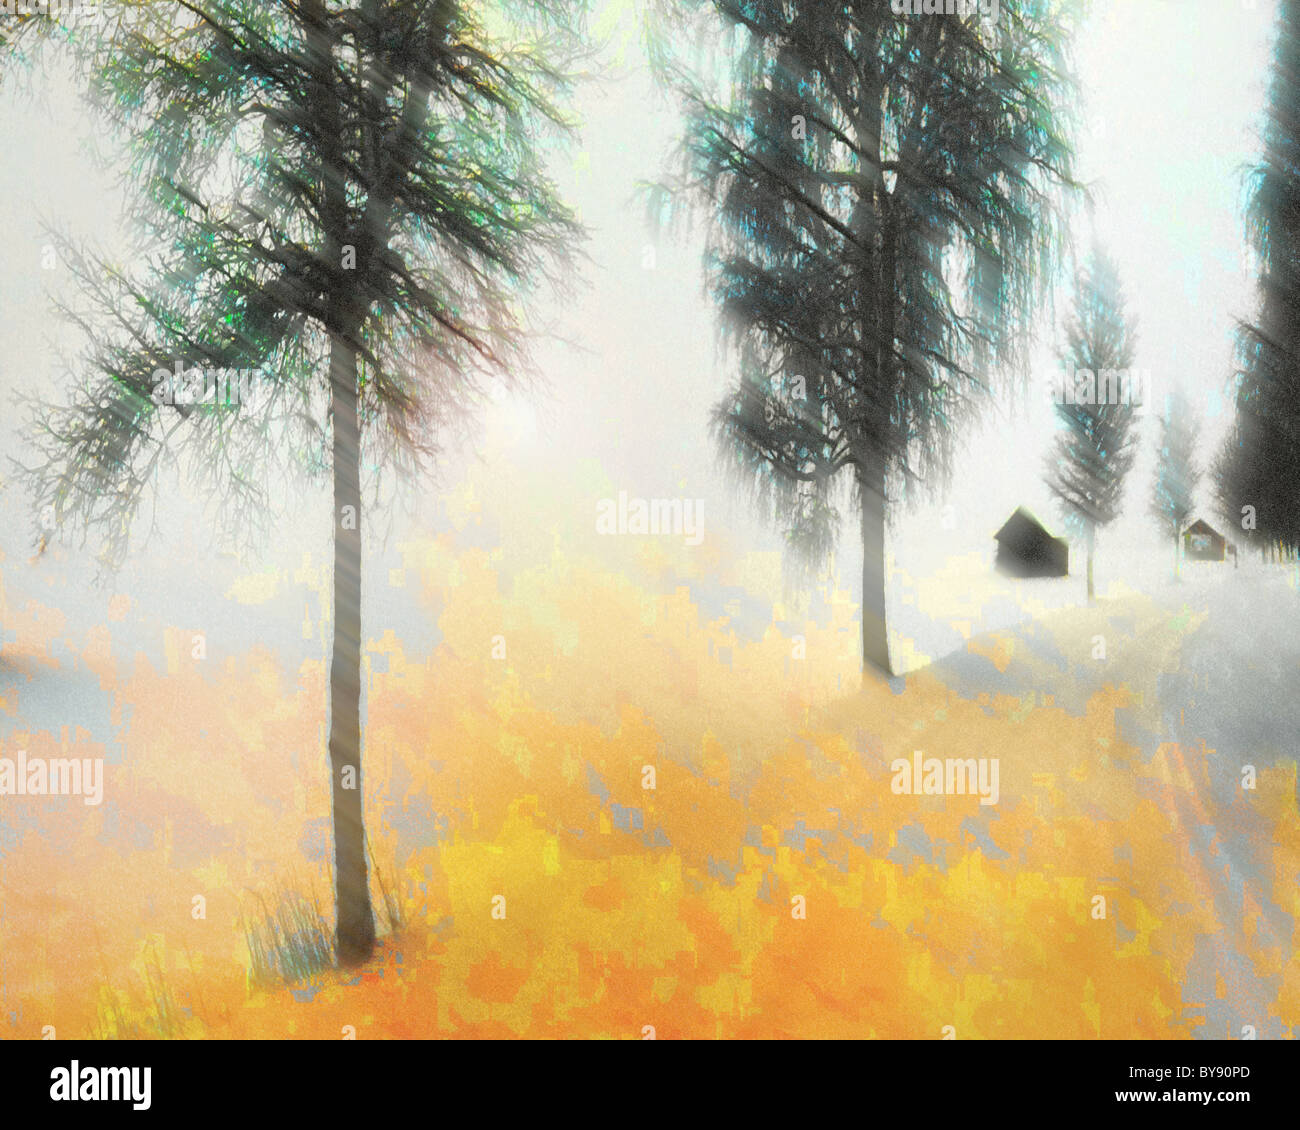 DIGITAL ART: Winter Scene (Germany/Bavaria) - Stock Image